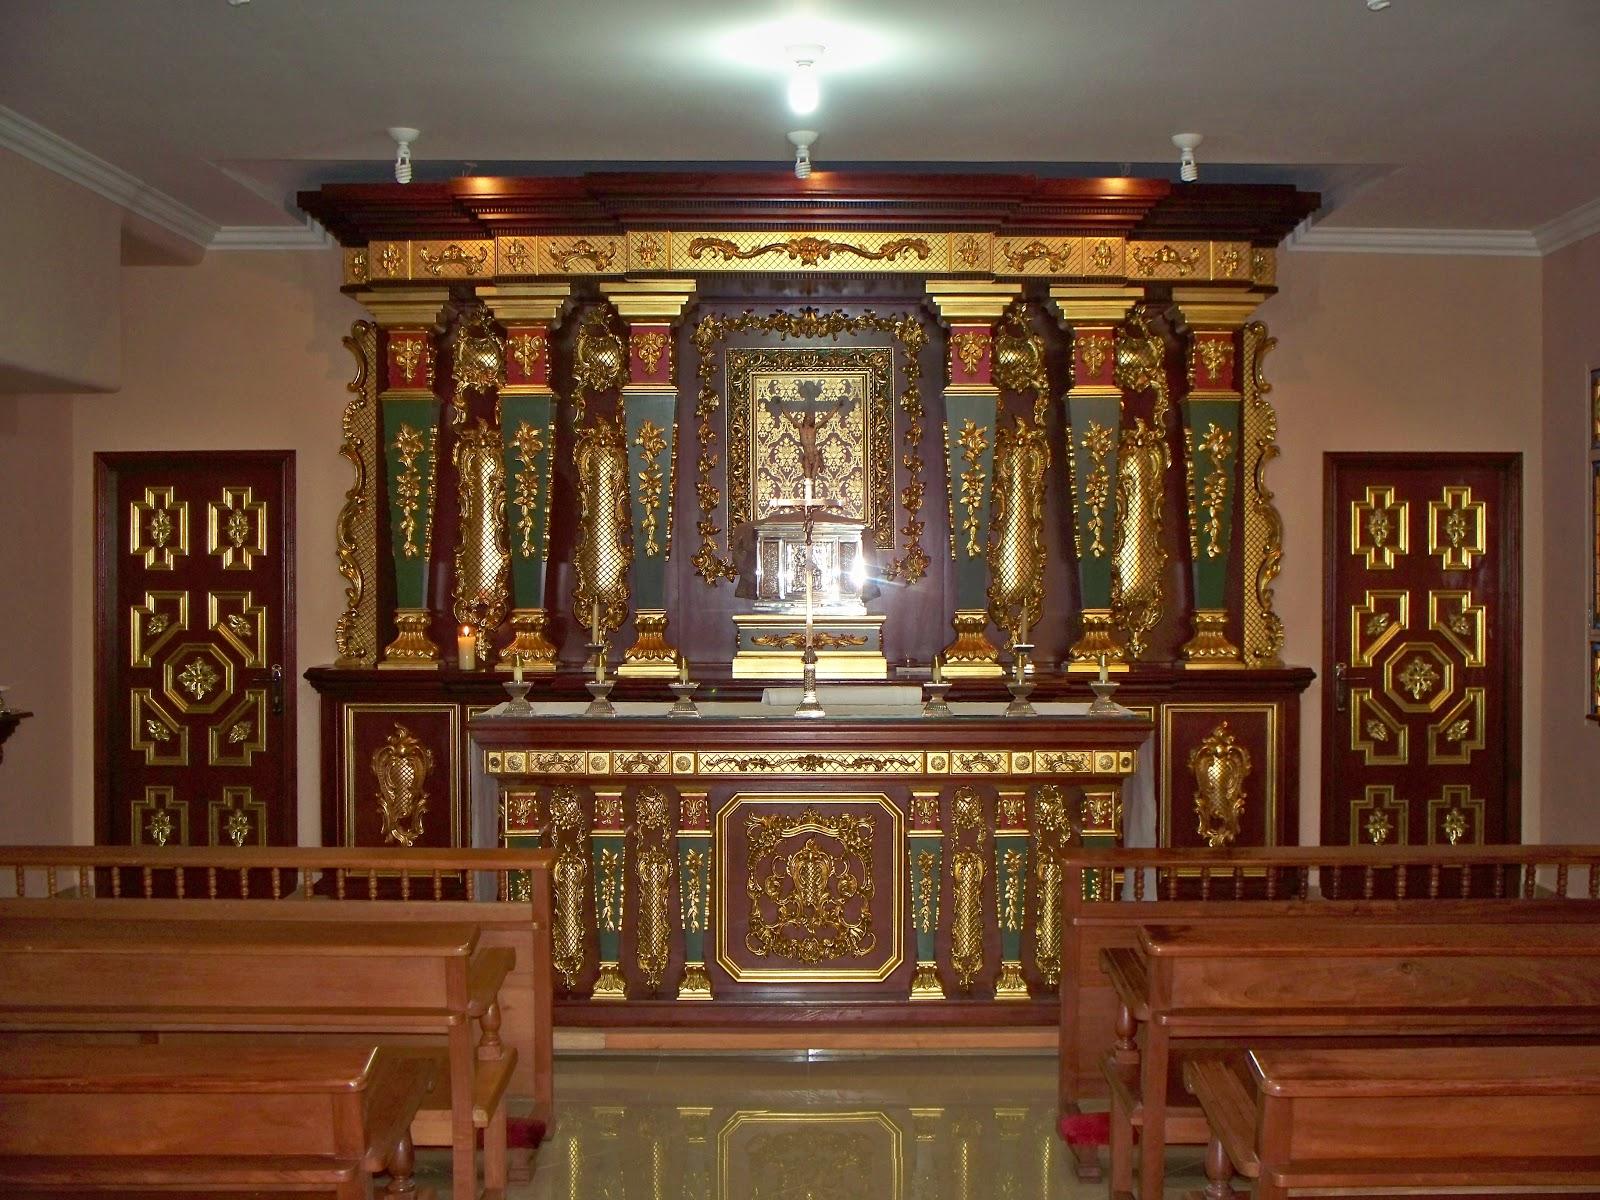 Oratorio centro cultural los bucares san cristobal edo for Arquitectura sacro